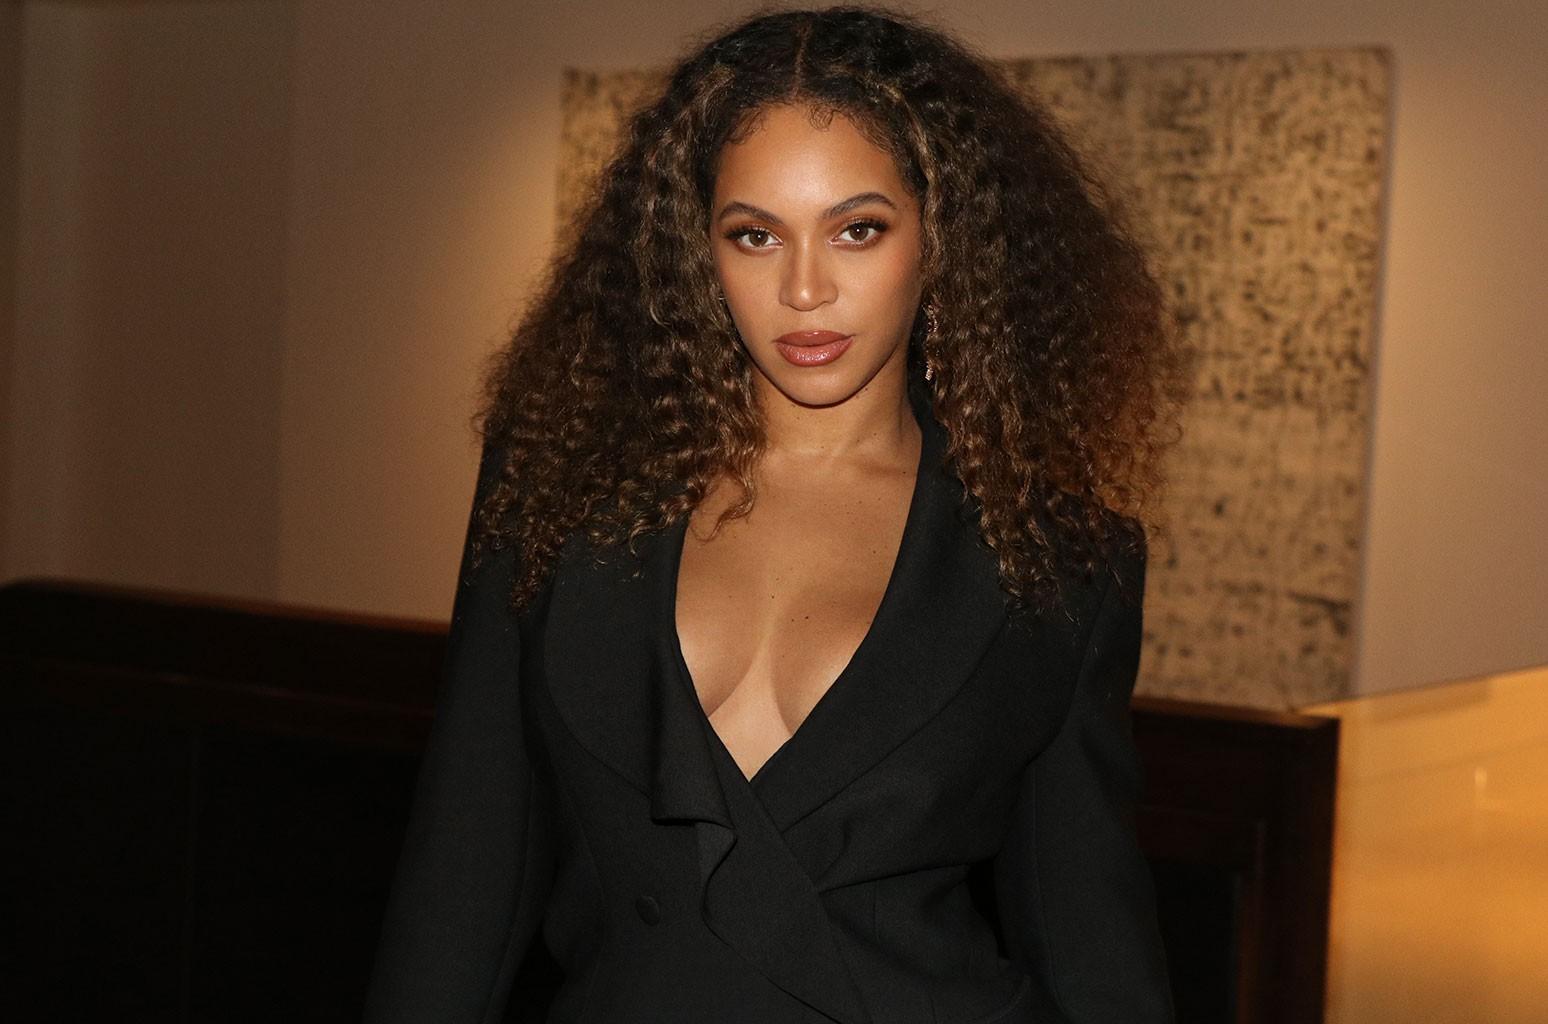 Beyoncéの人気曲ランキングTOP20・おすすめ曲7選まとめ